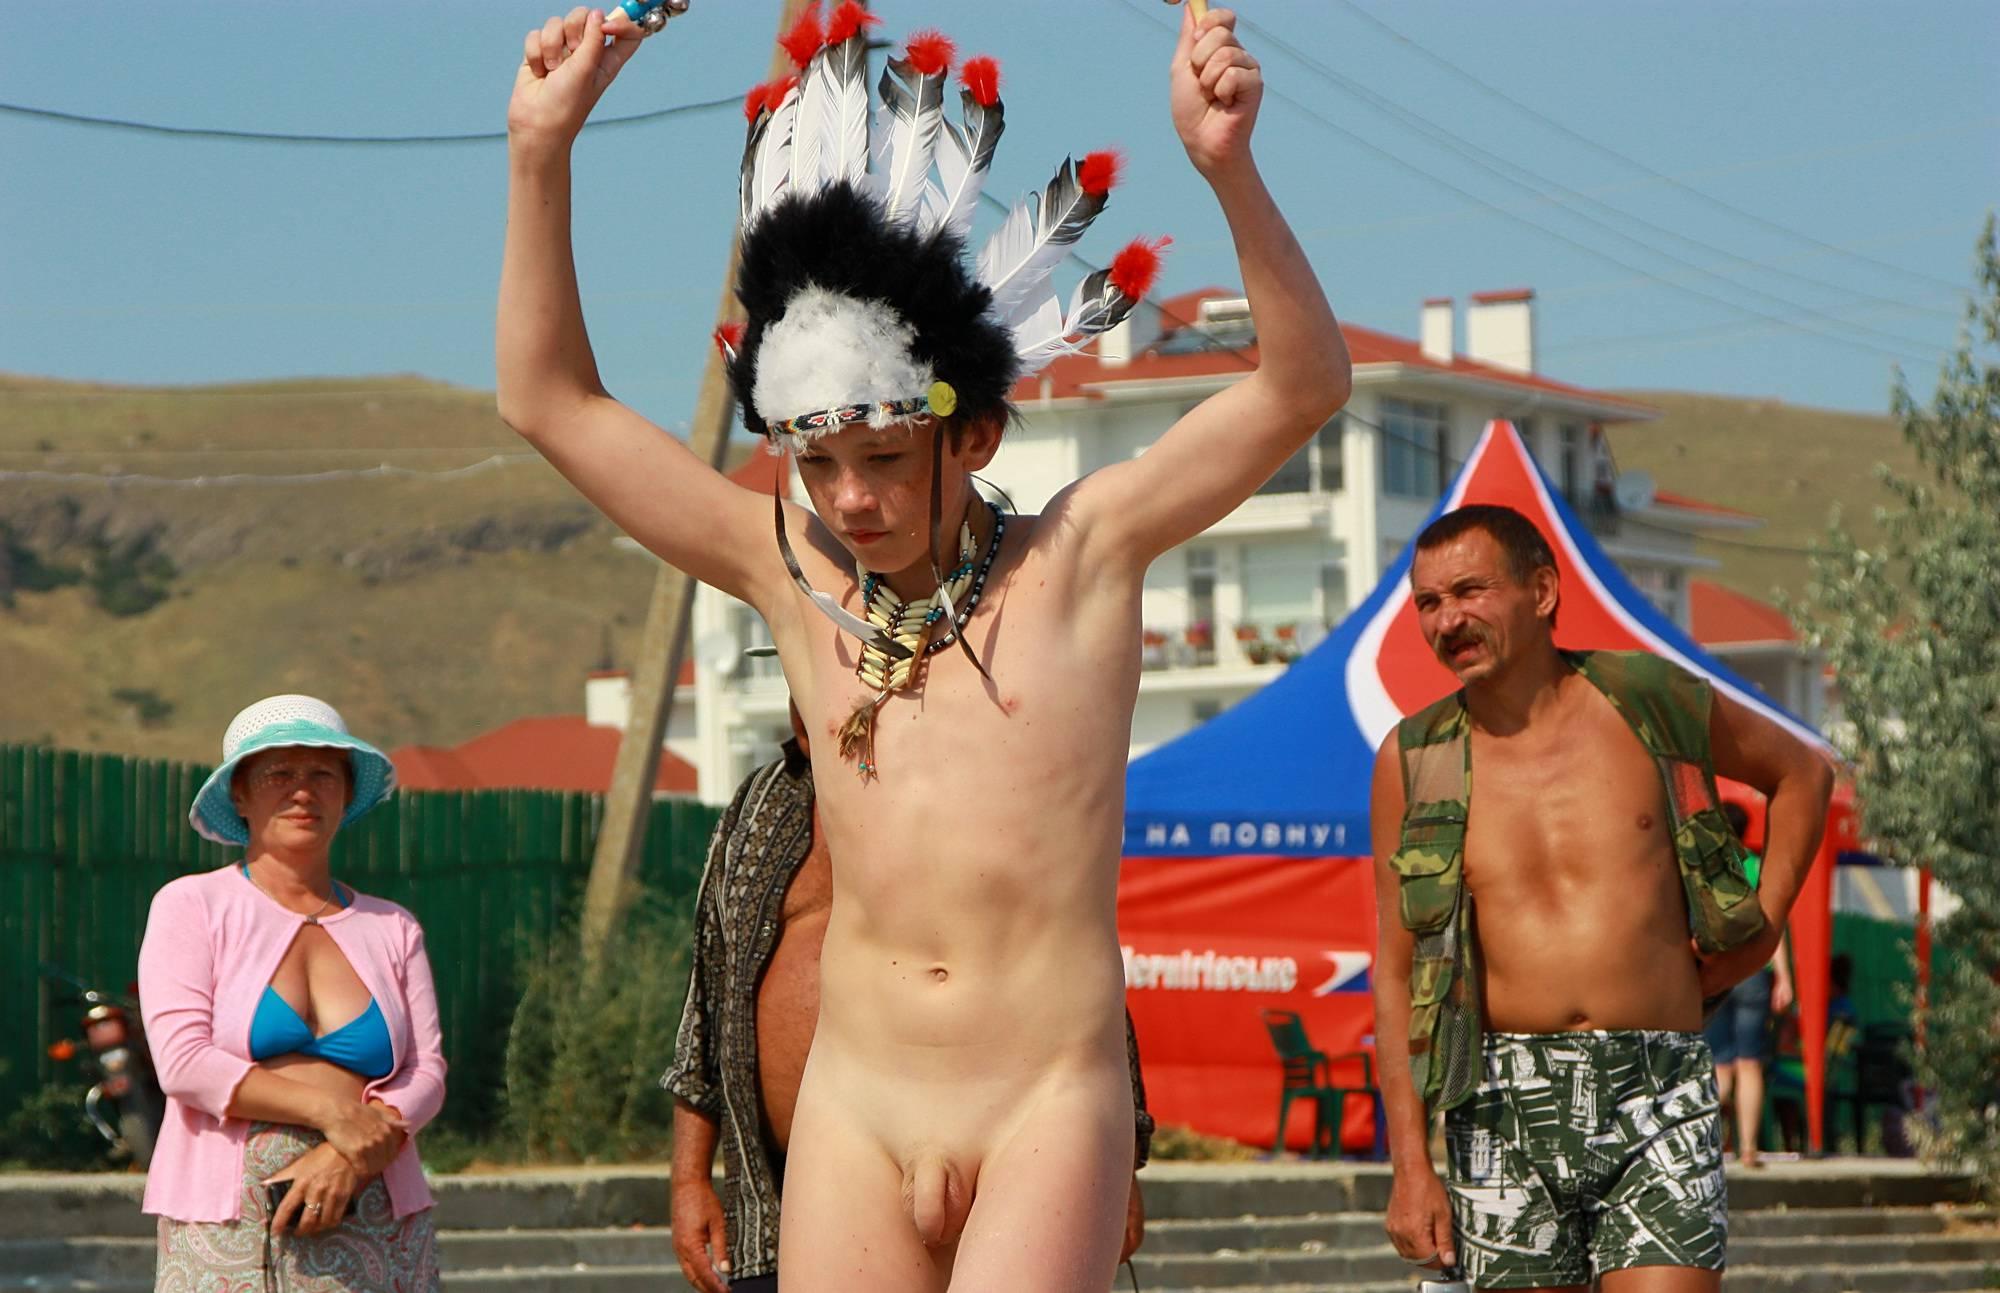 Purenudism Photos-Native Headdress Dance - 2